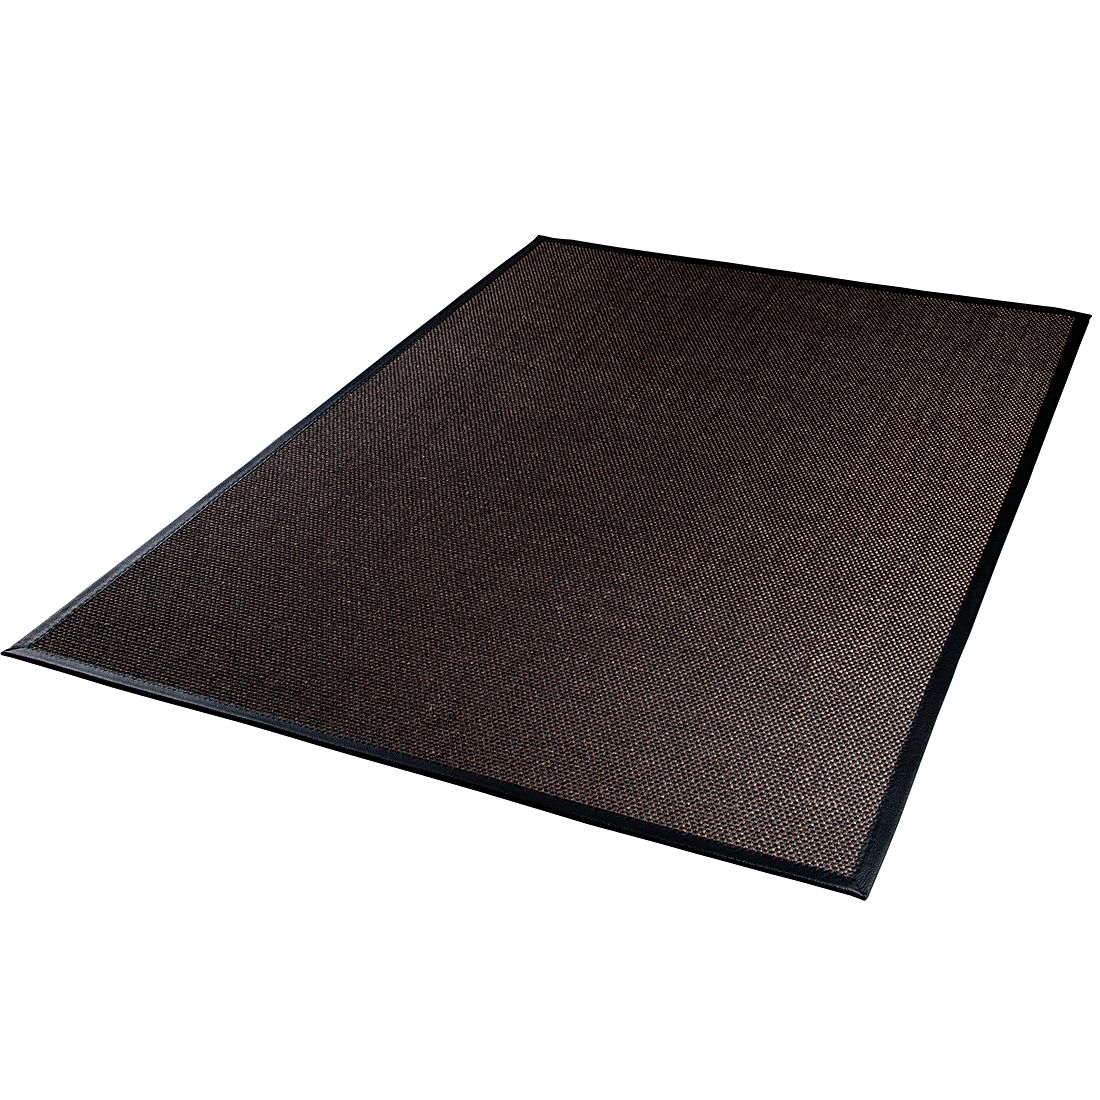 Teppich Medina – Schwarz / Dunkelbraun – 133 x 190 cm, DEKOWE bestellen